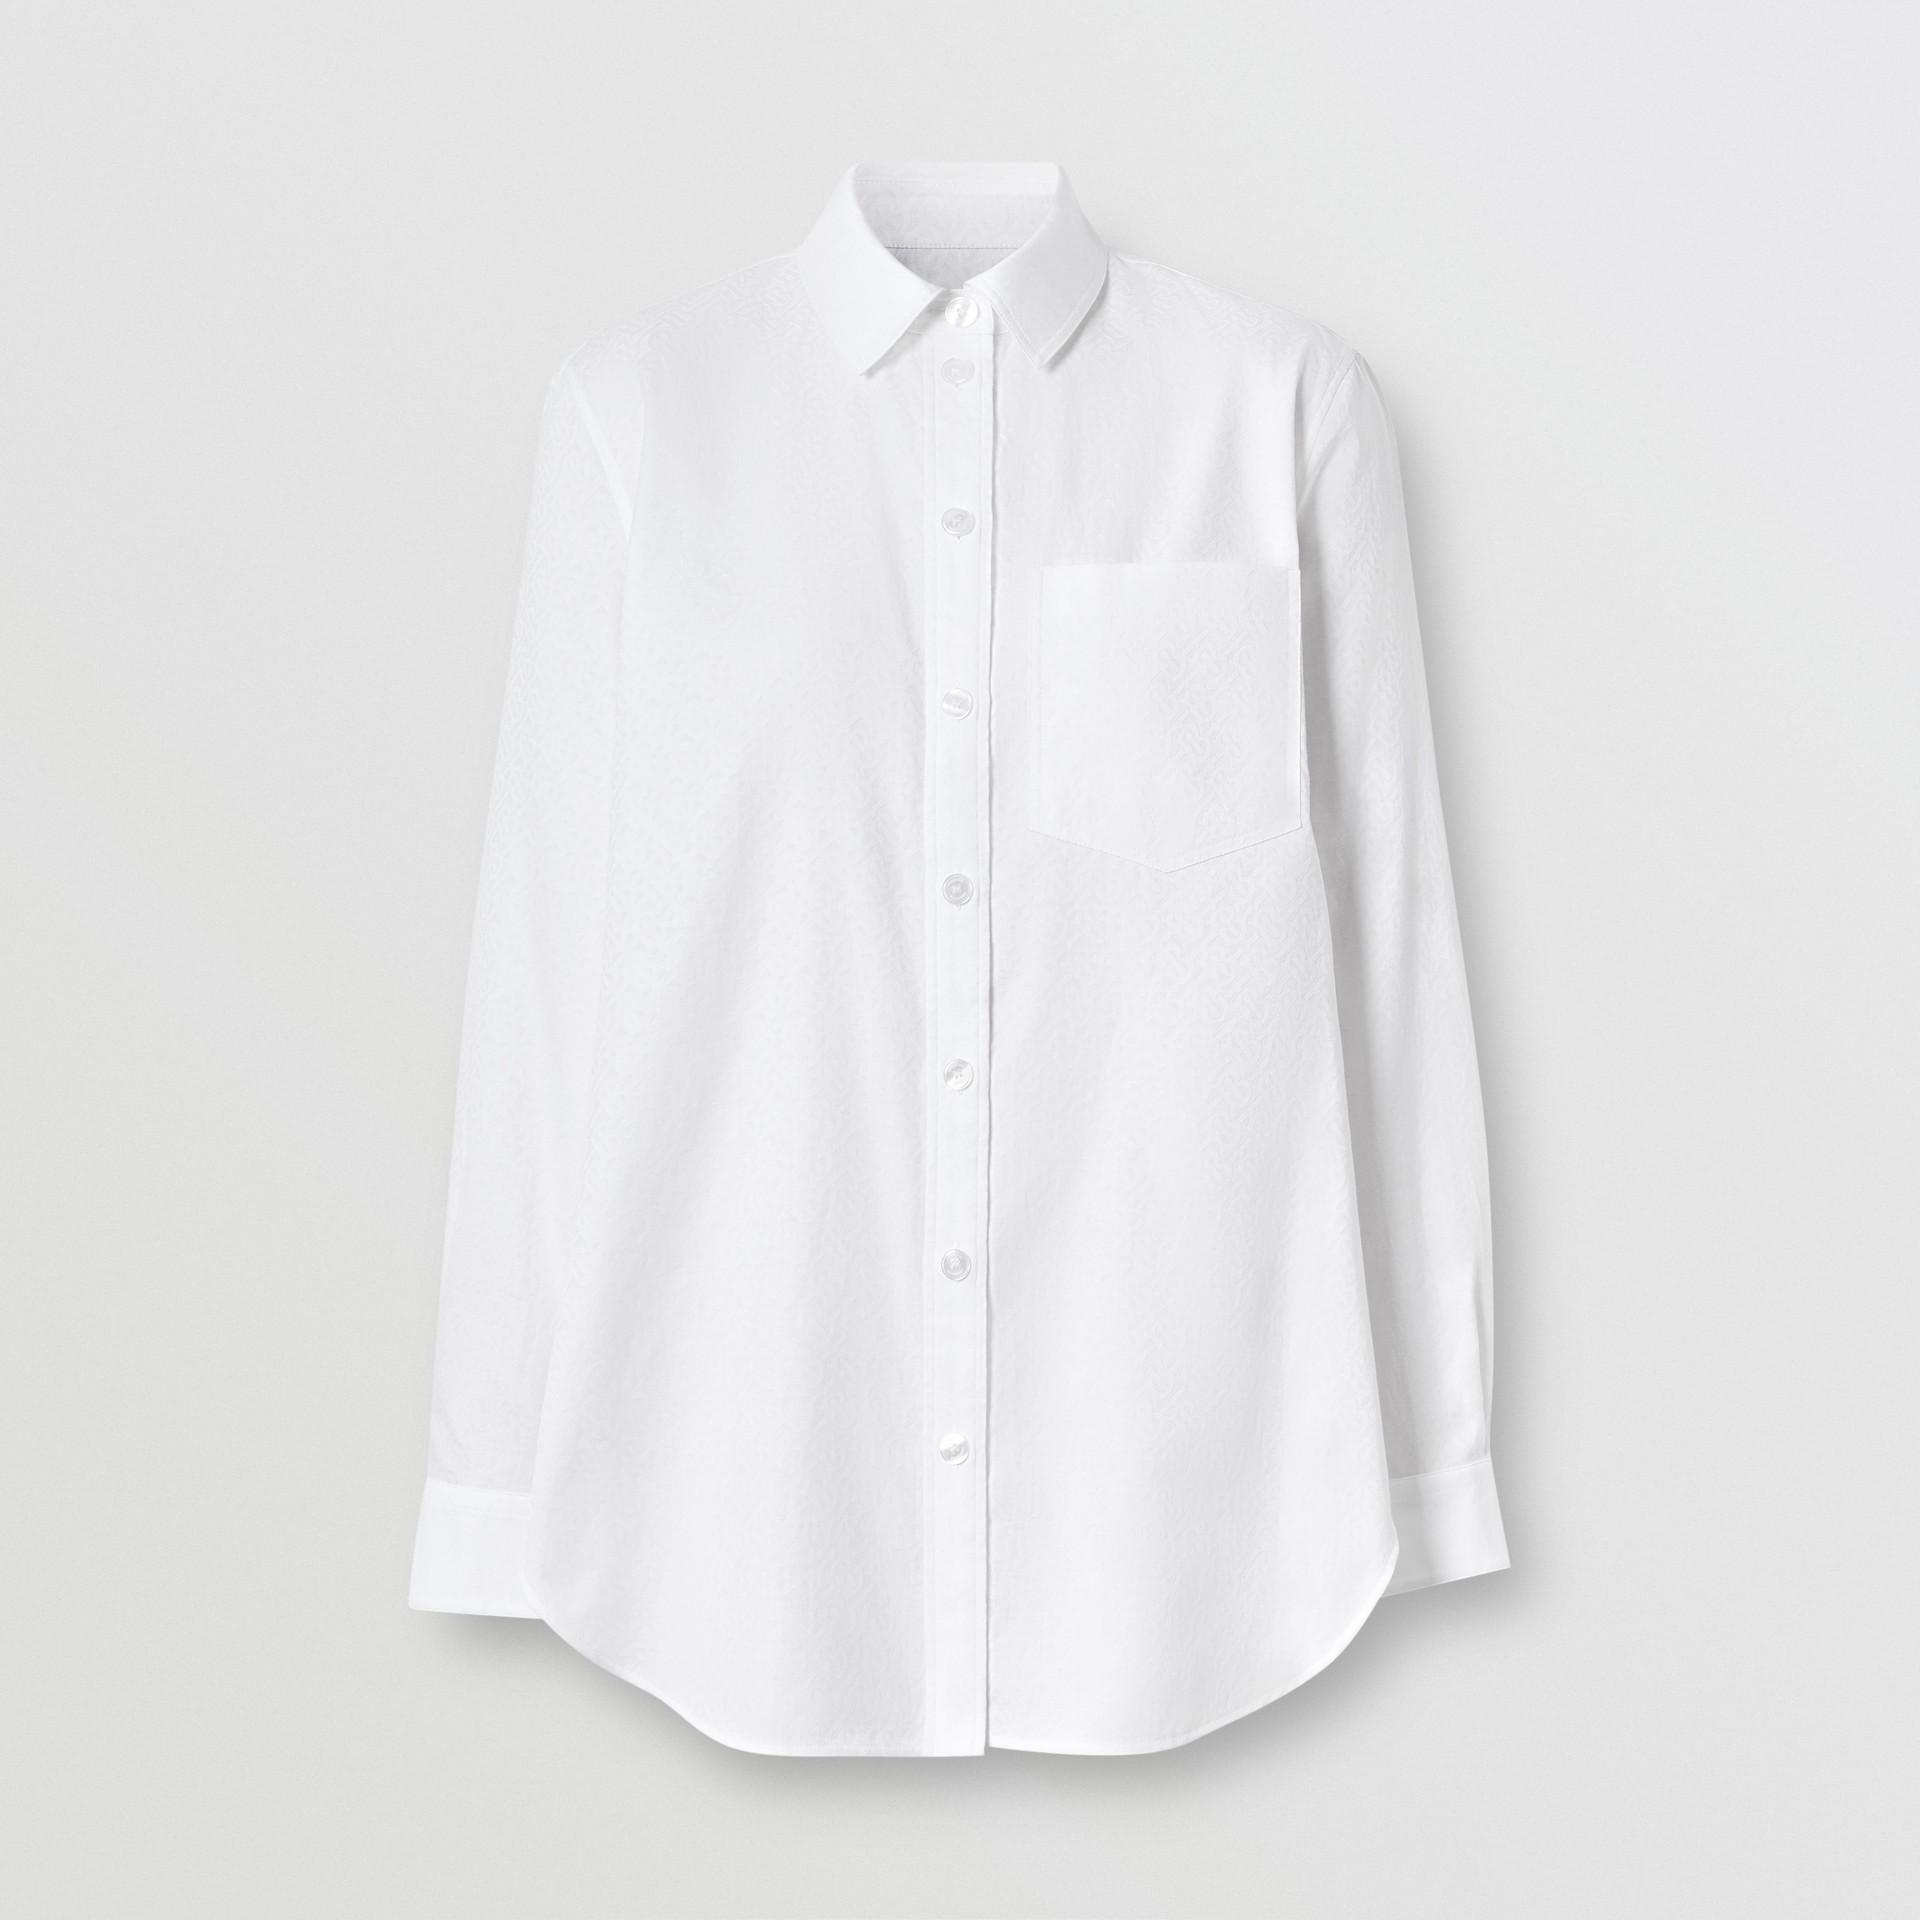 Monogram Cotton Jacquard Shirt in Optic White - Women | Burberry United Kingdom - gallery image 3